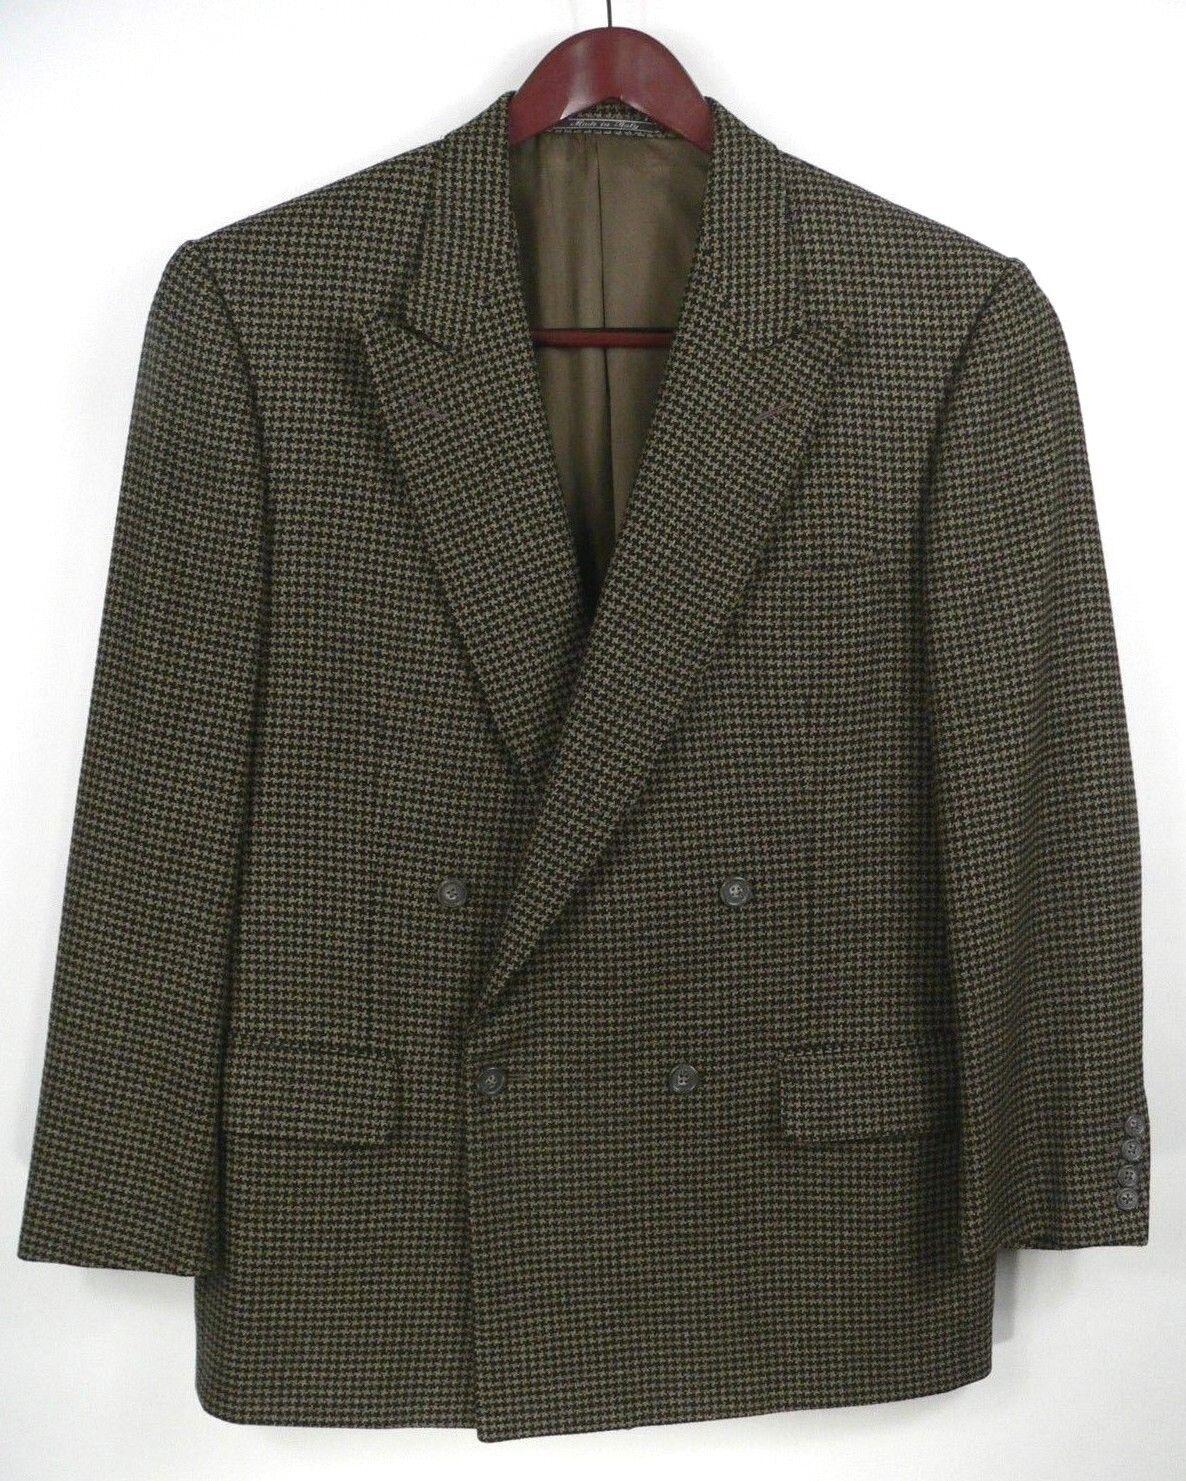 Ermenegildo Zegna Men's Double Breasted Wool Cashmere HT Blazer Measures 40-42R